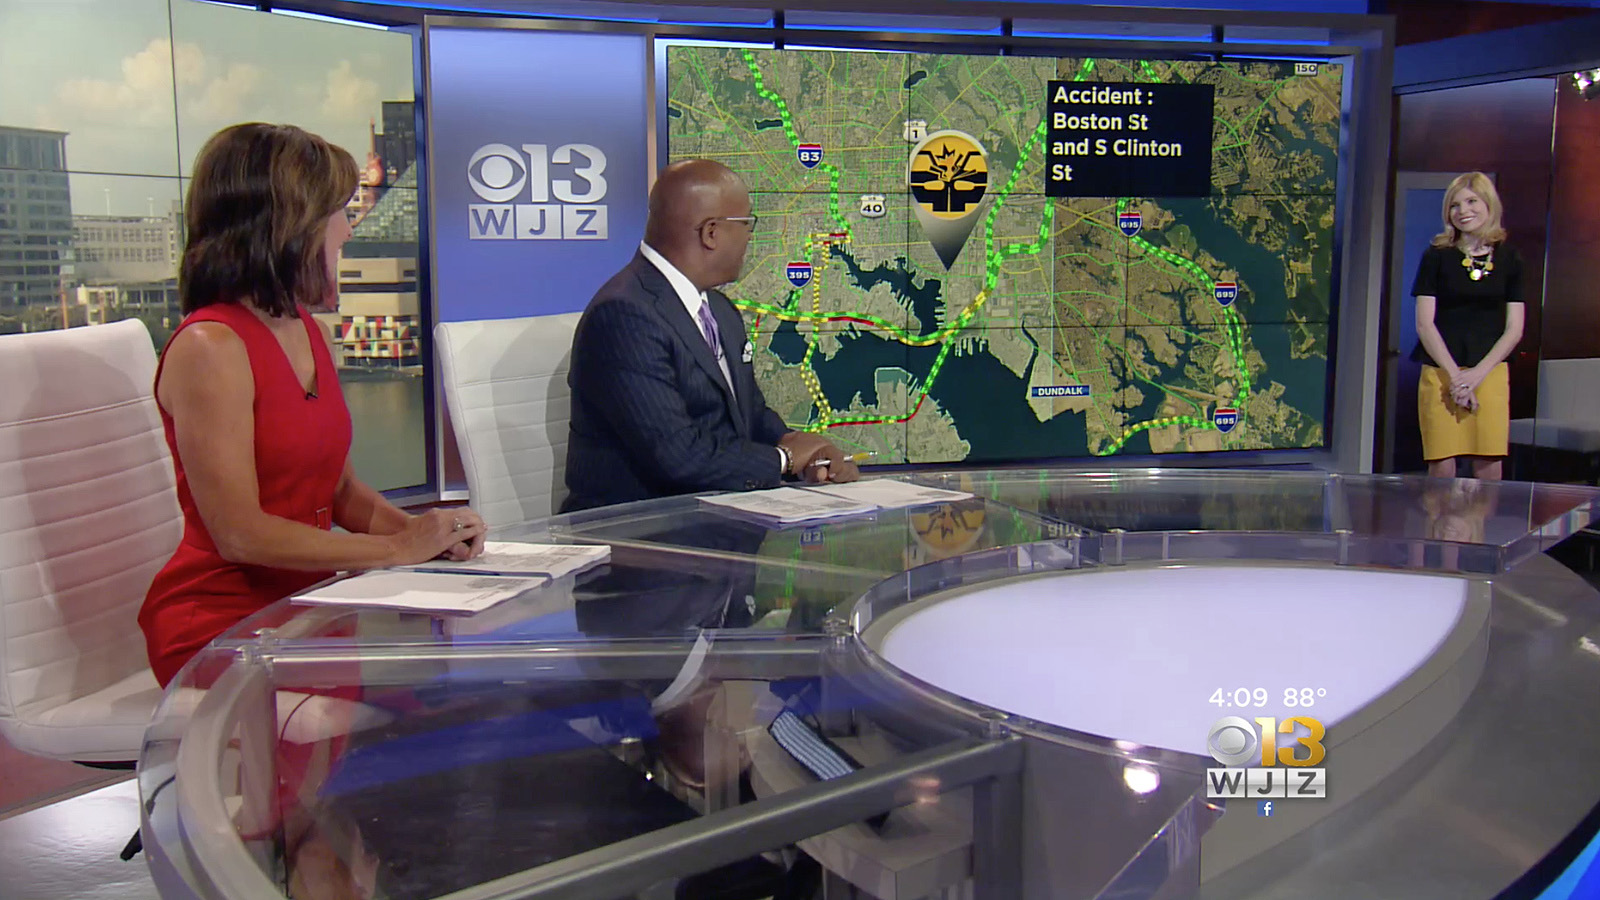 ncs_WJZ-CBS-13-Baltimore-TV-Studio_0007